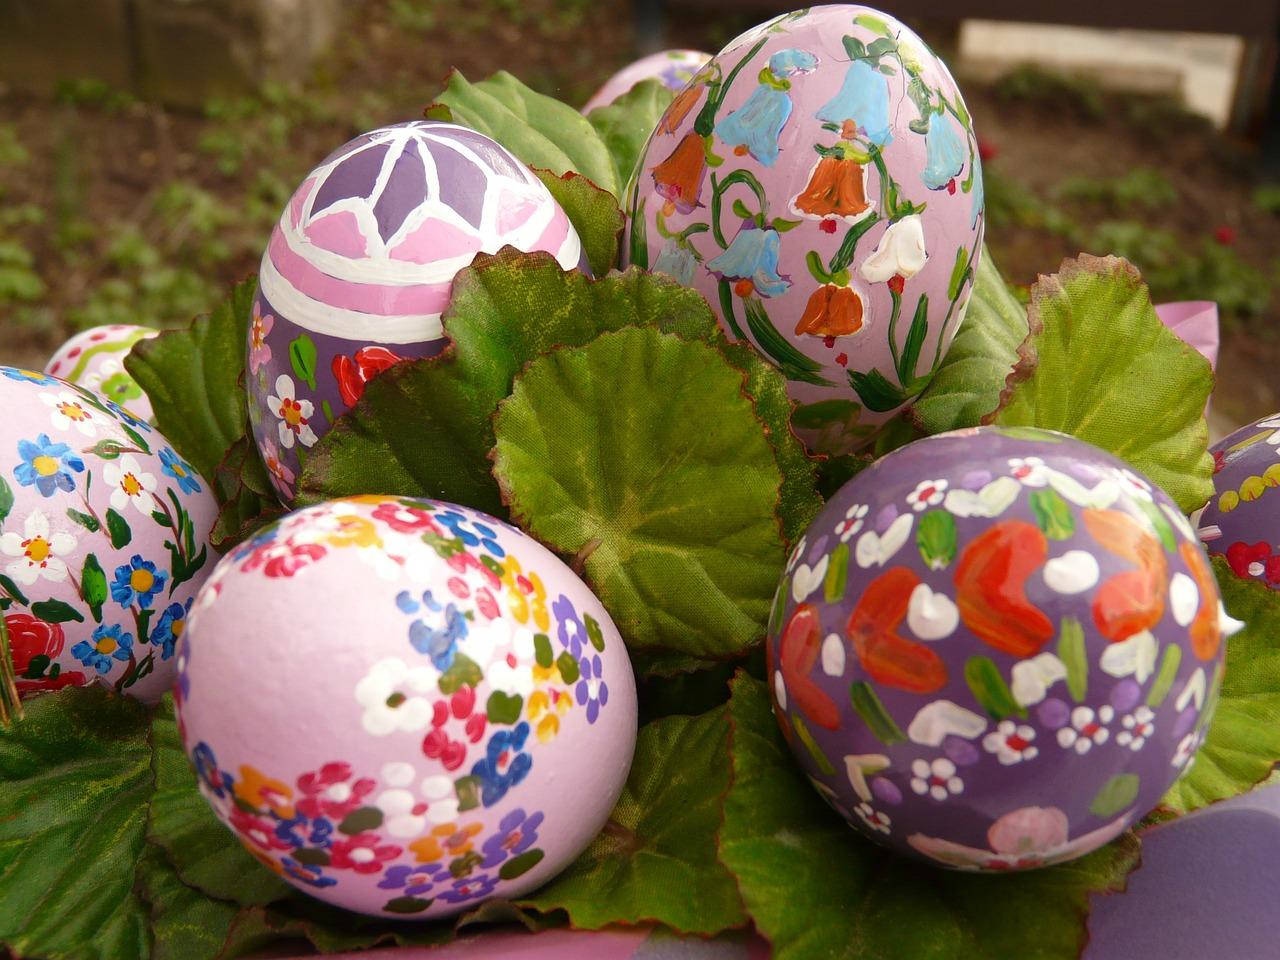 Фото цветы на пасхальных яйцах